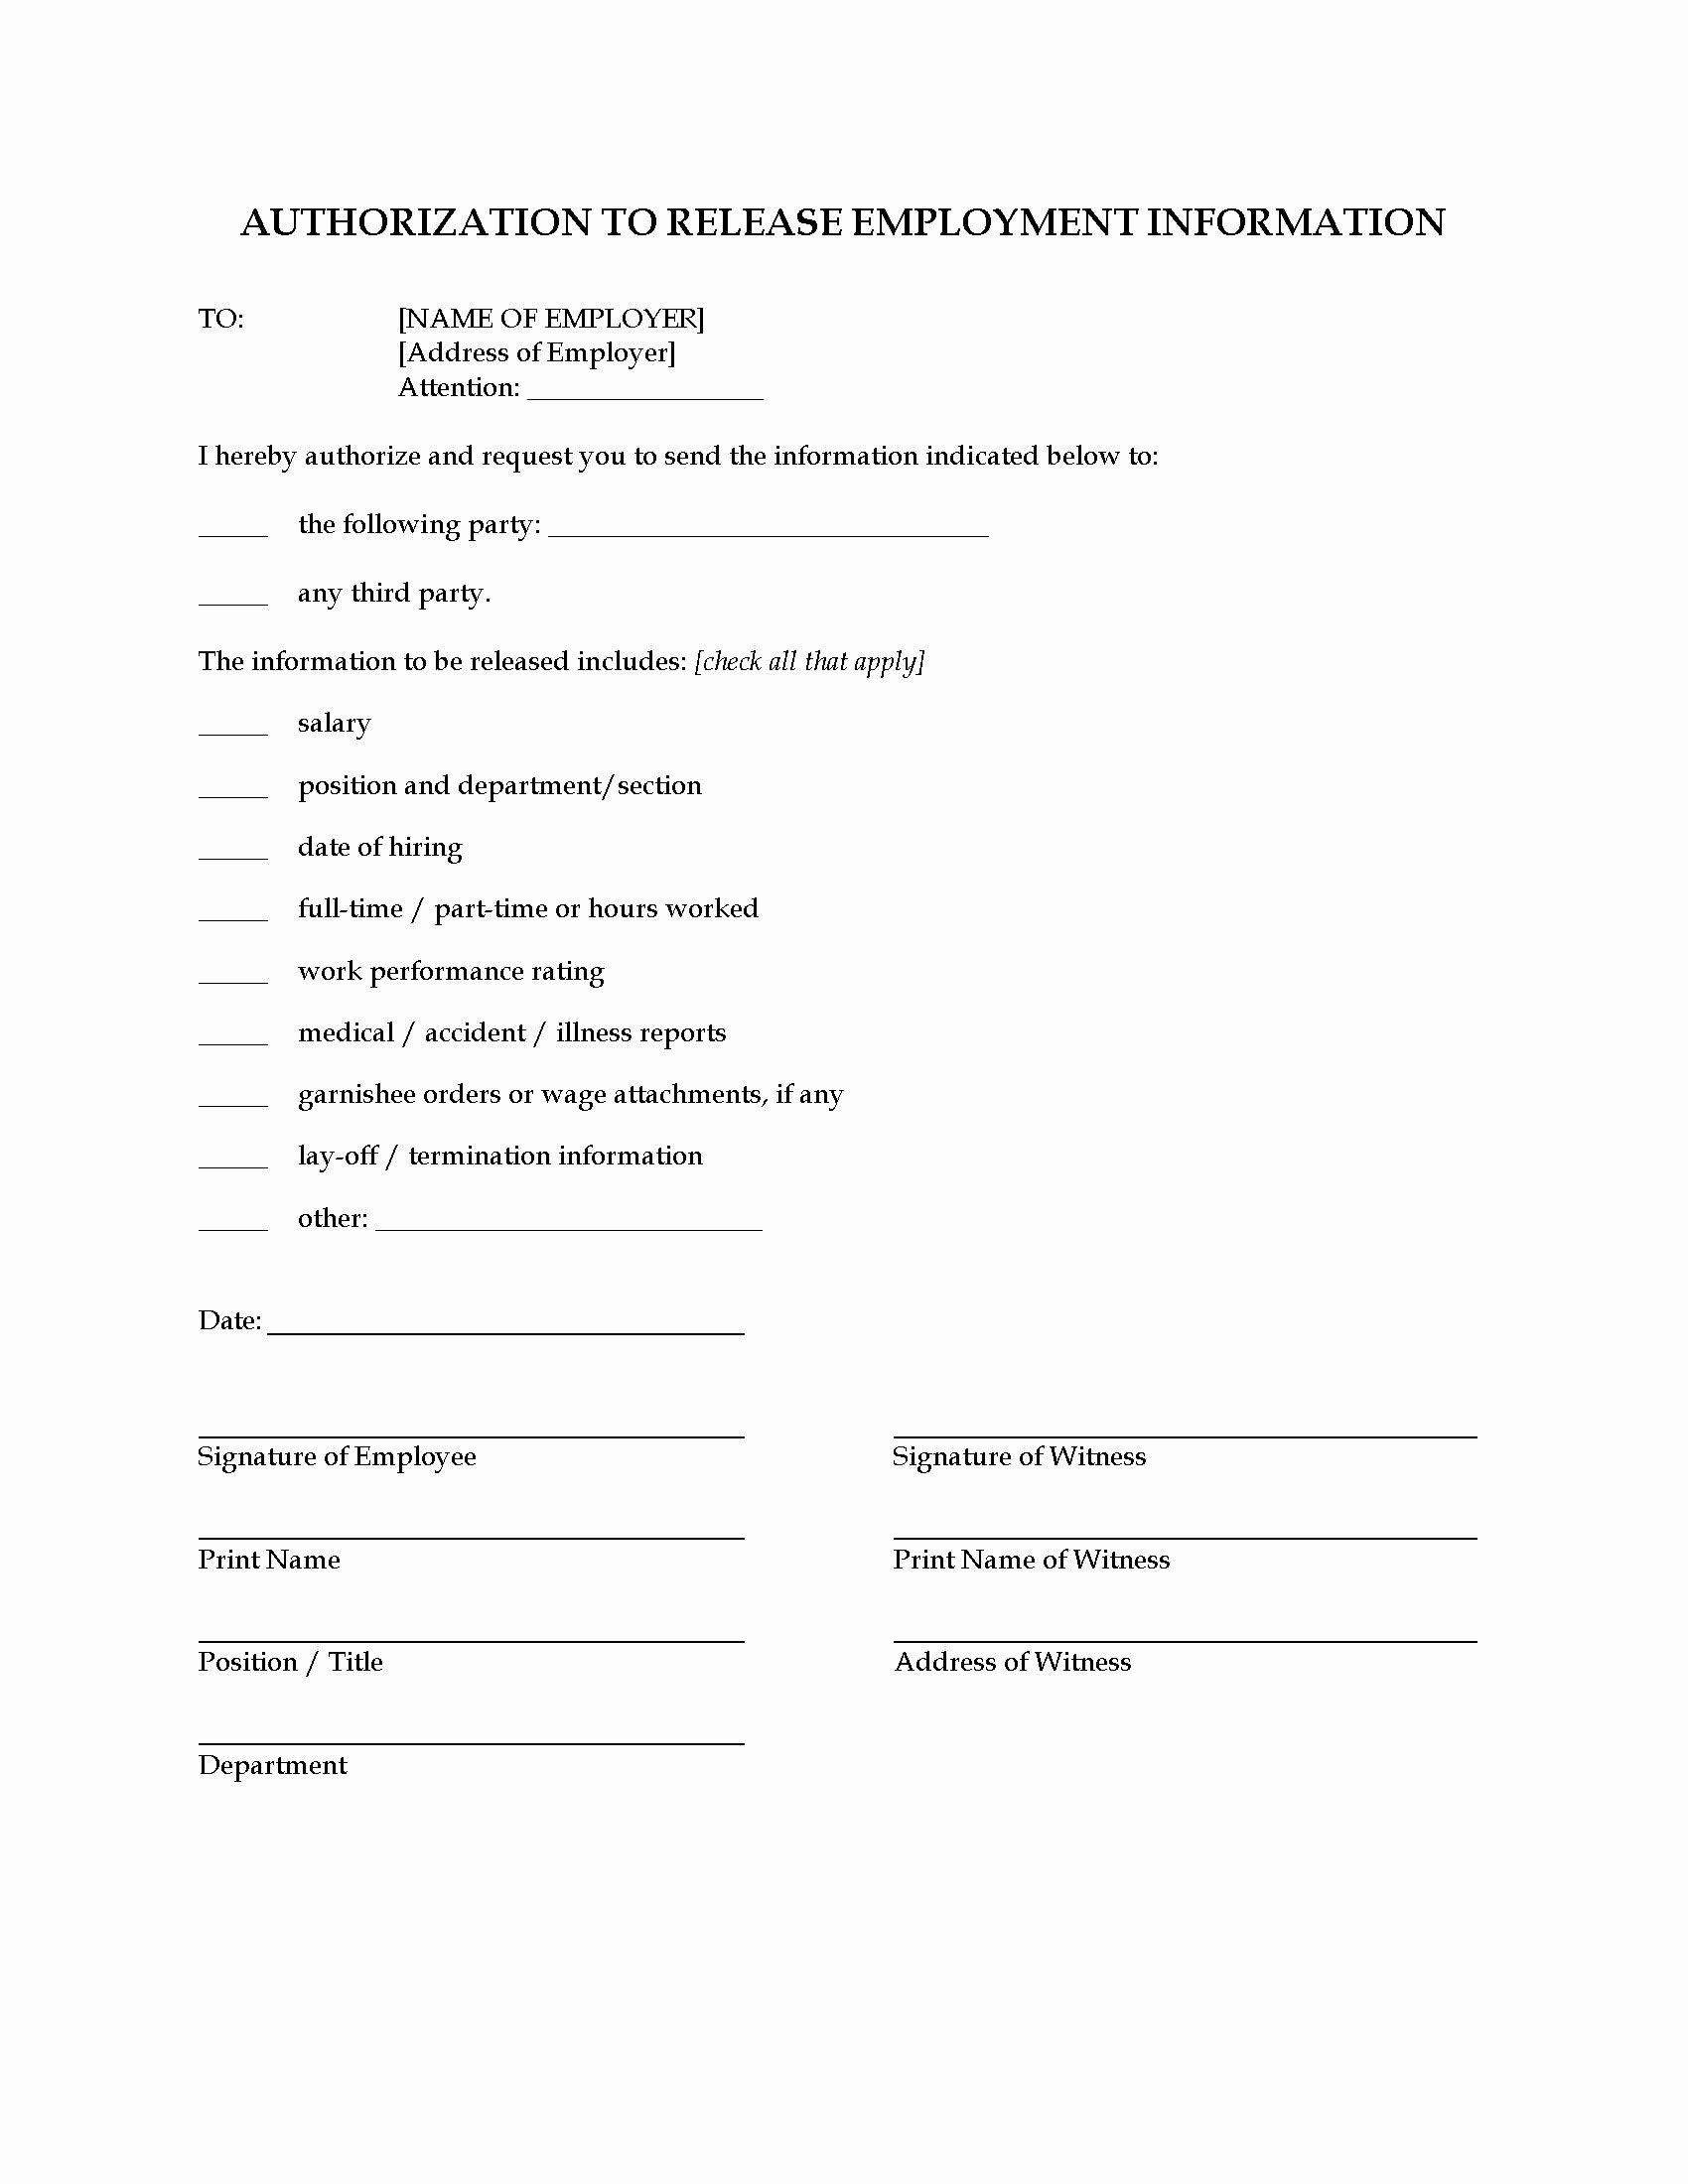 Employment Verification Release form Elegant Consent to Release Employment Information